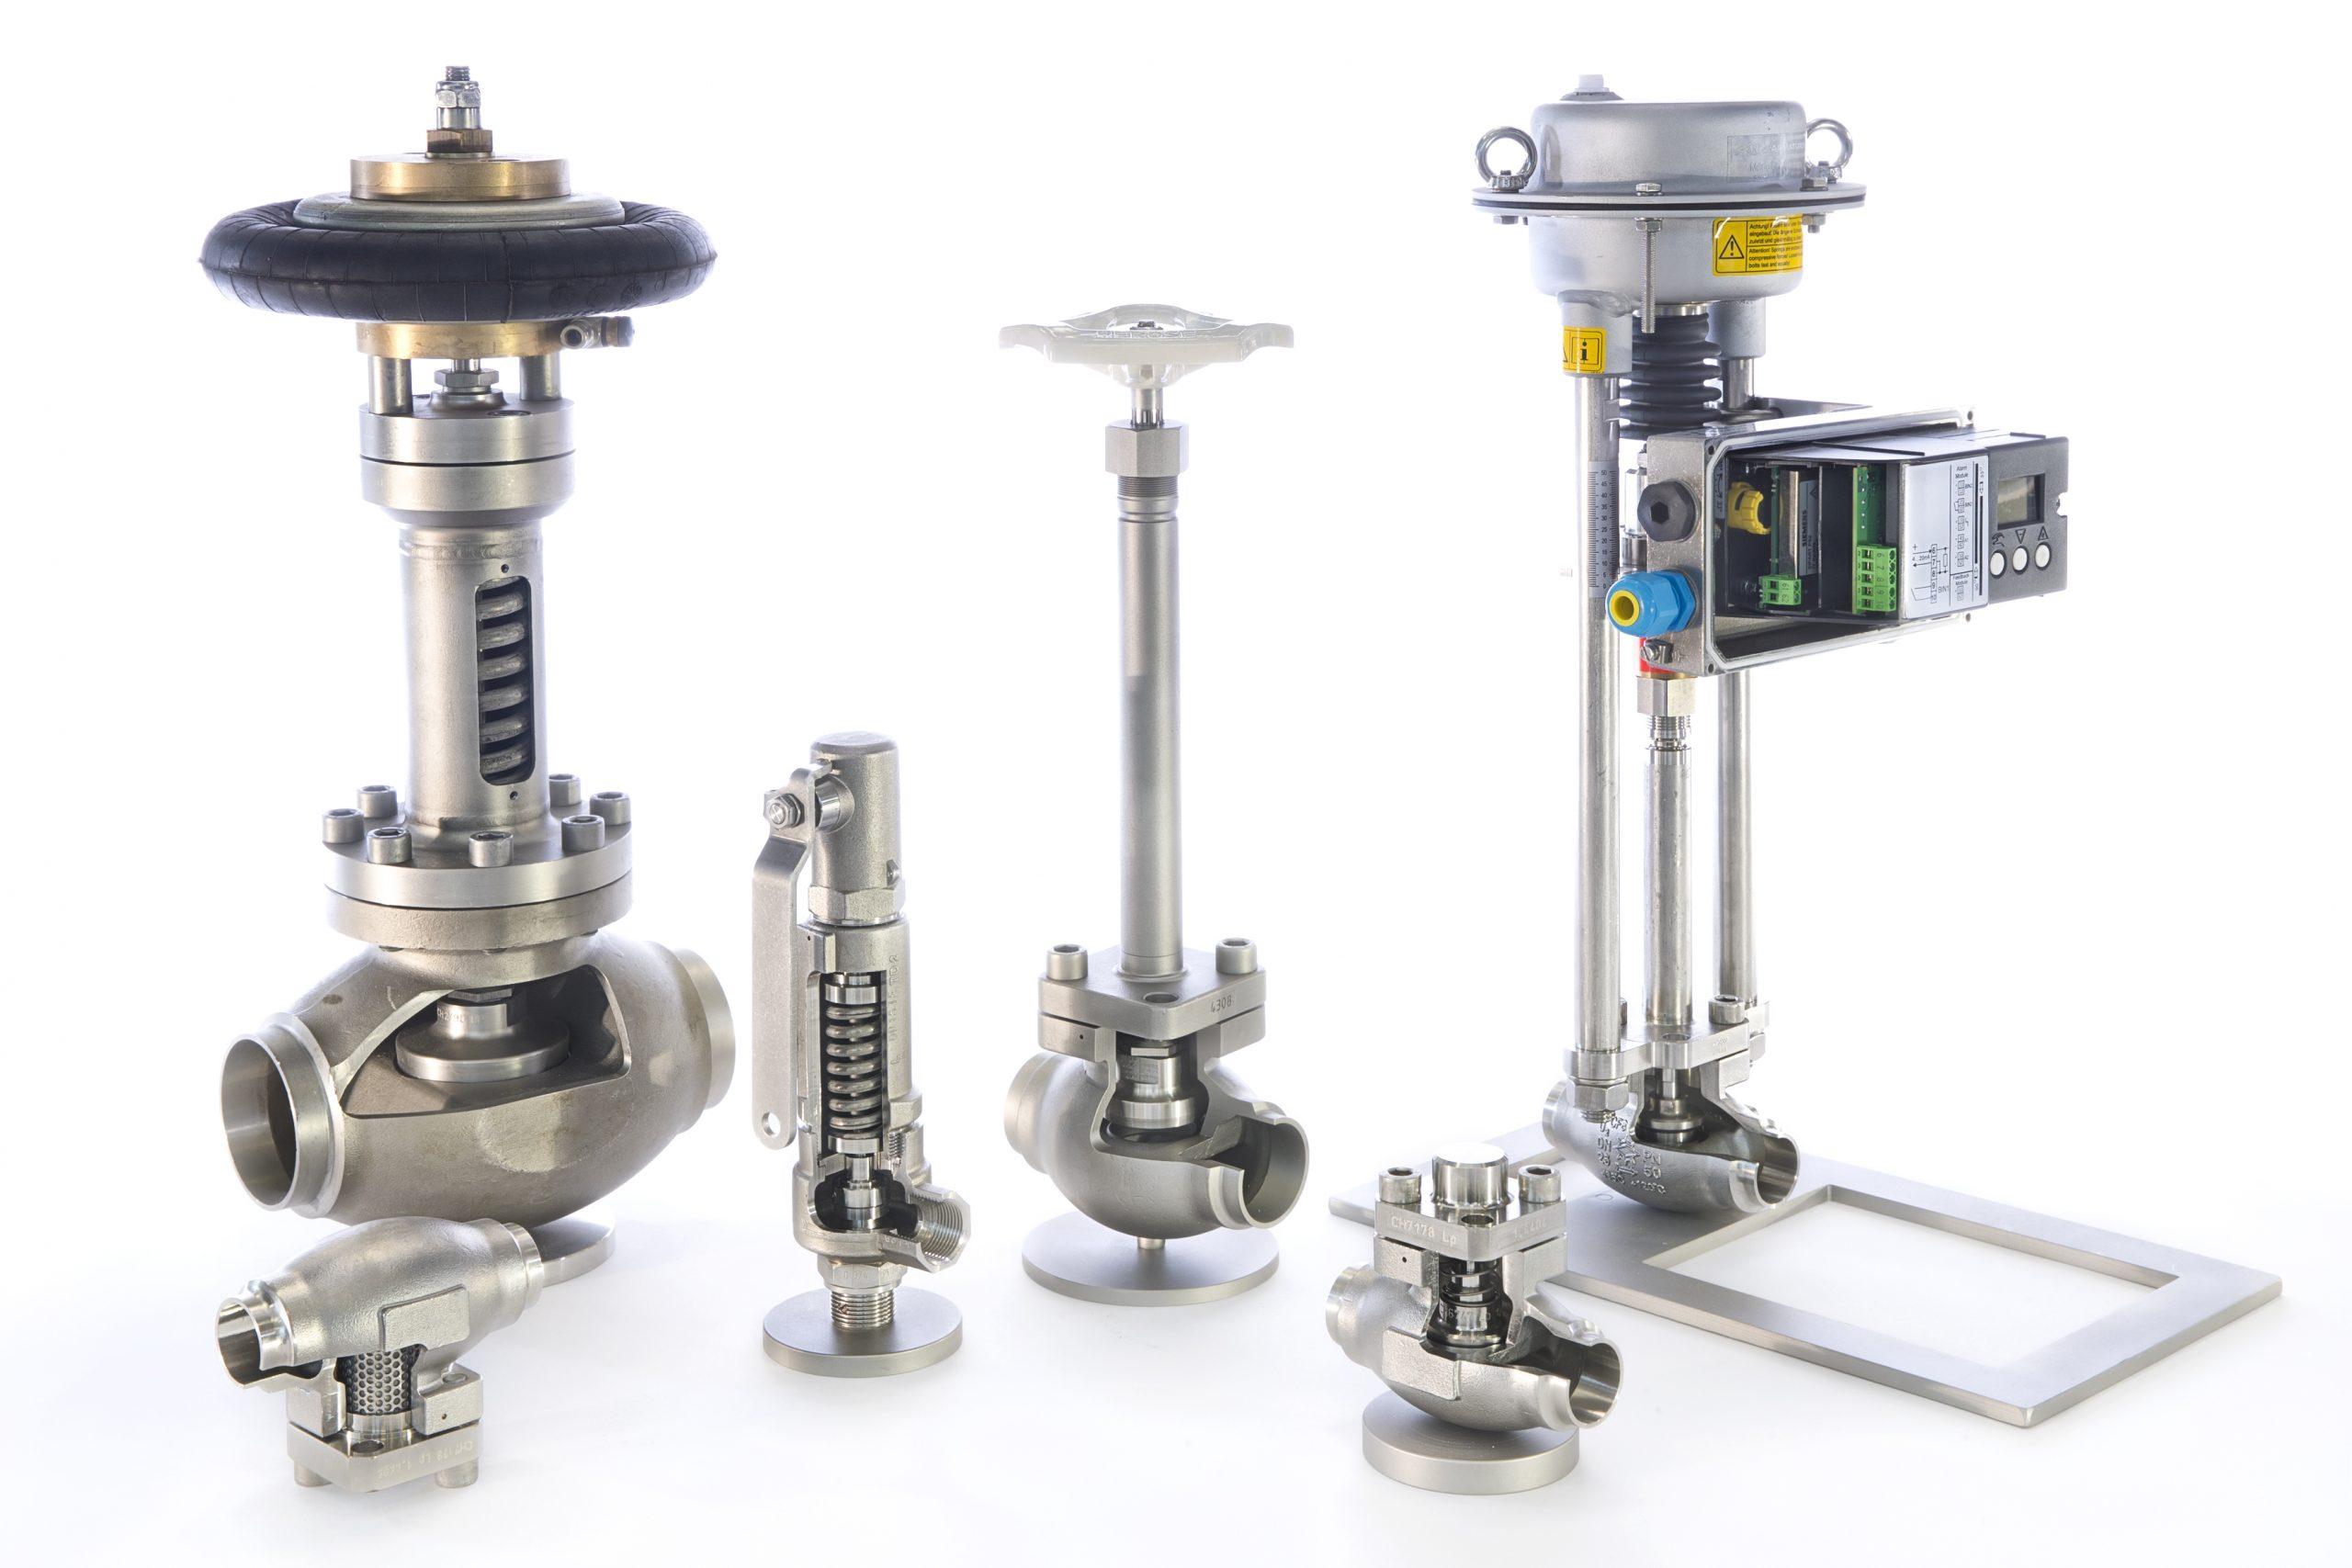 cryogenic LNG valves